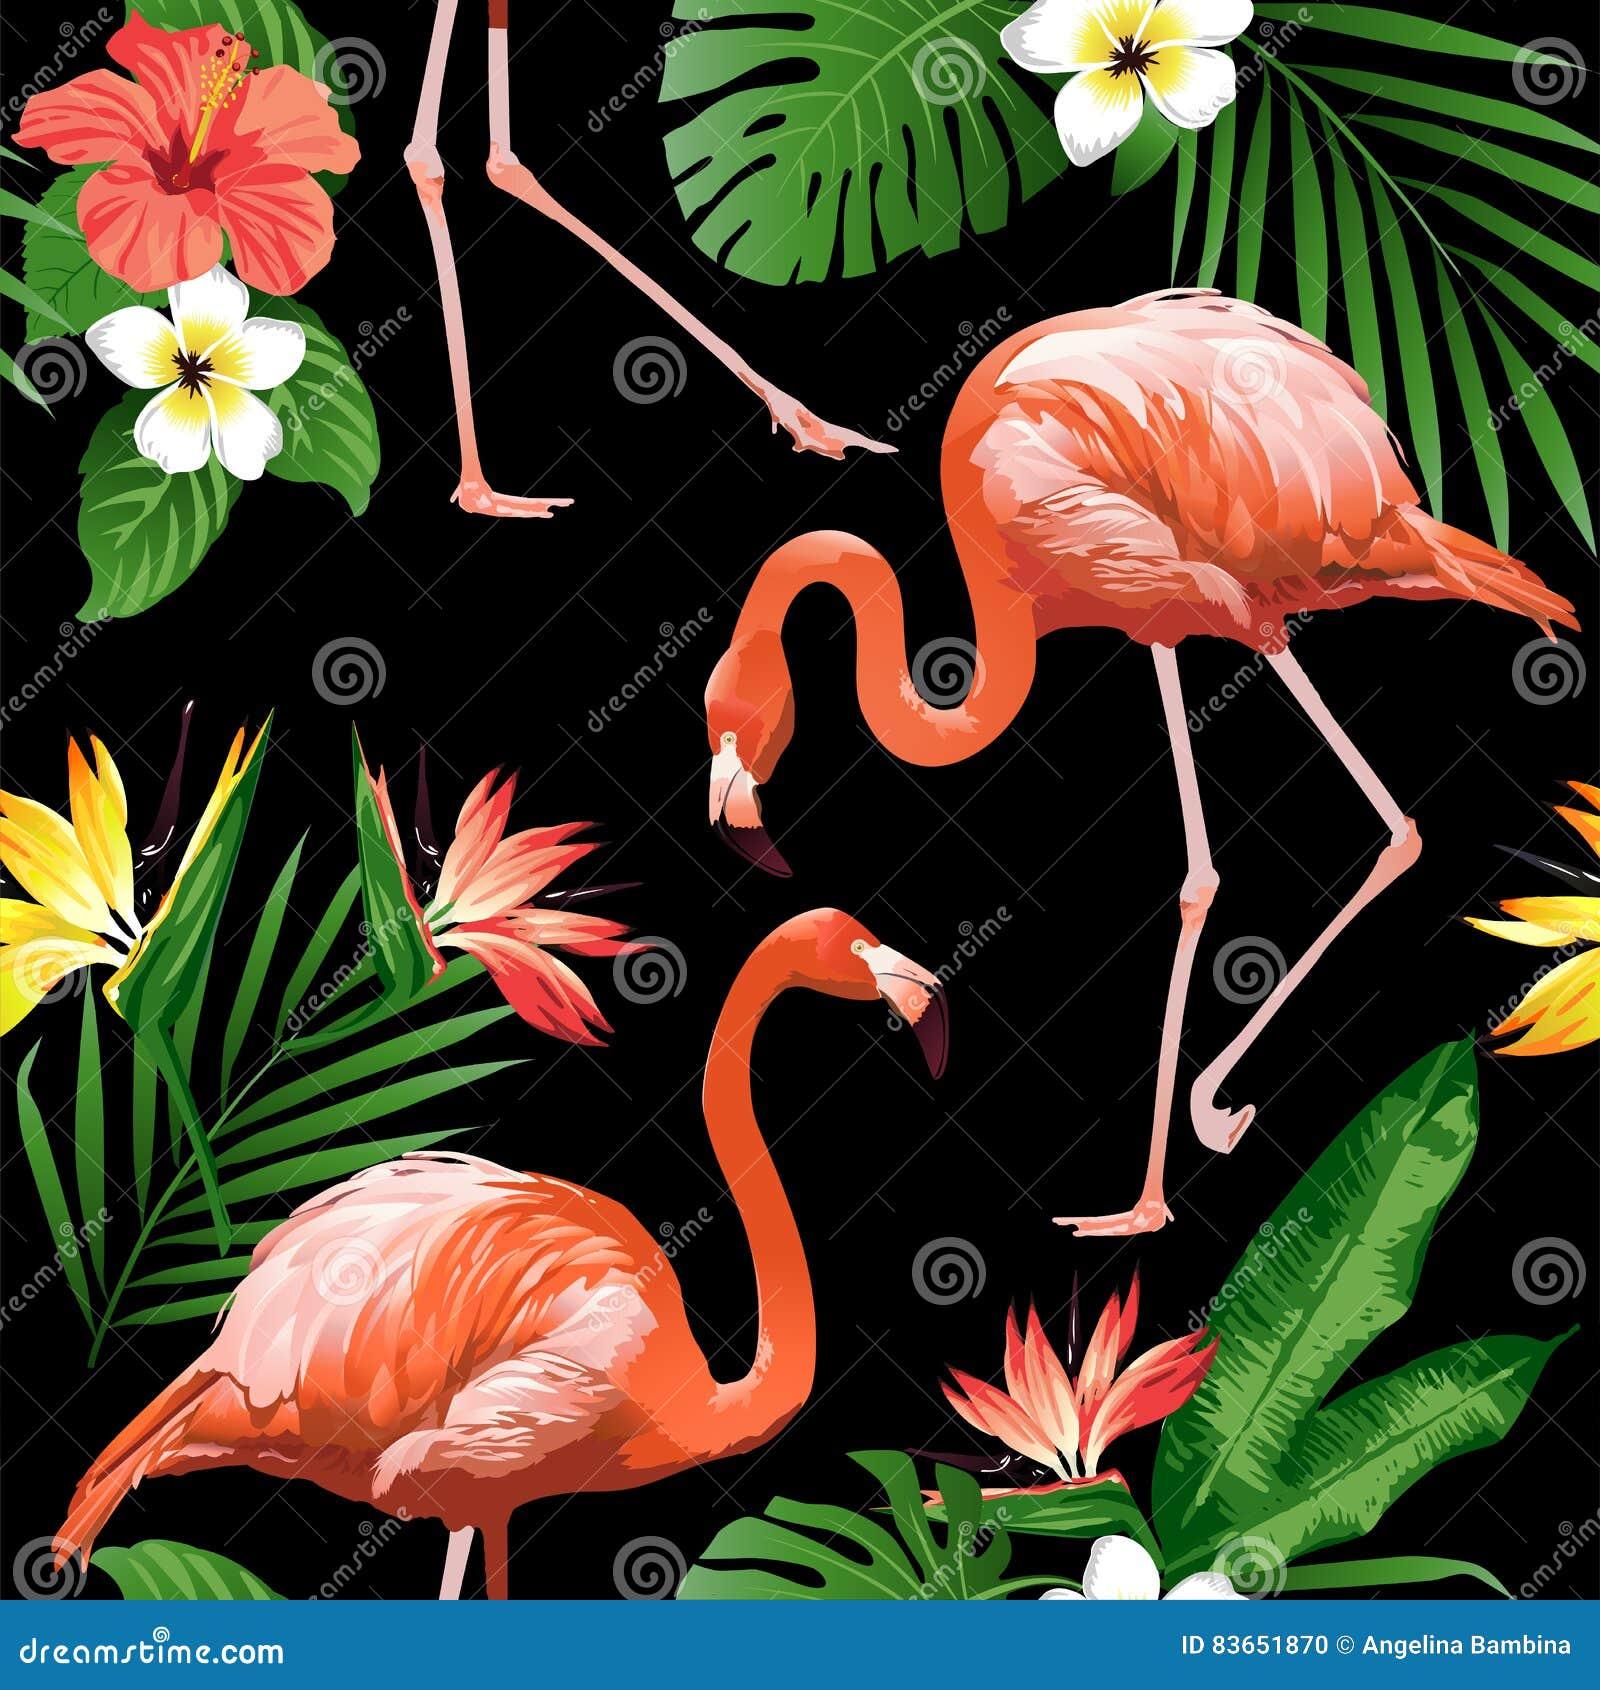 Flamingo Bird and Tropical Flowers Background